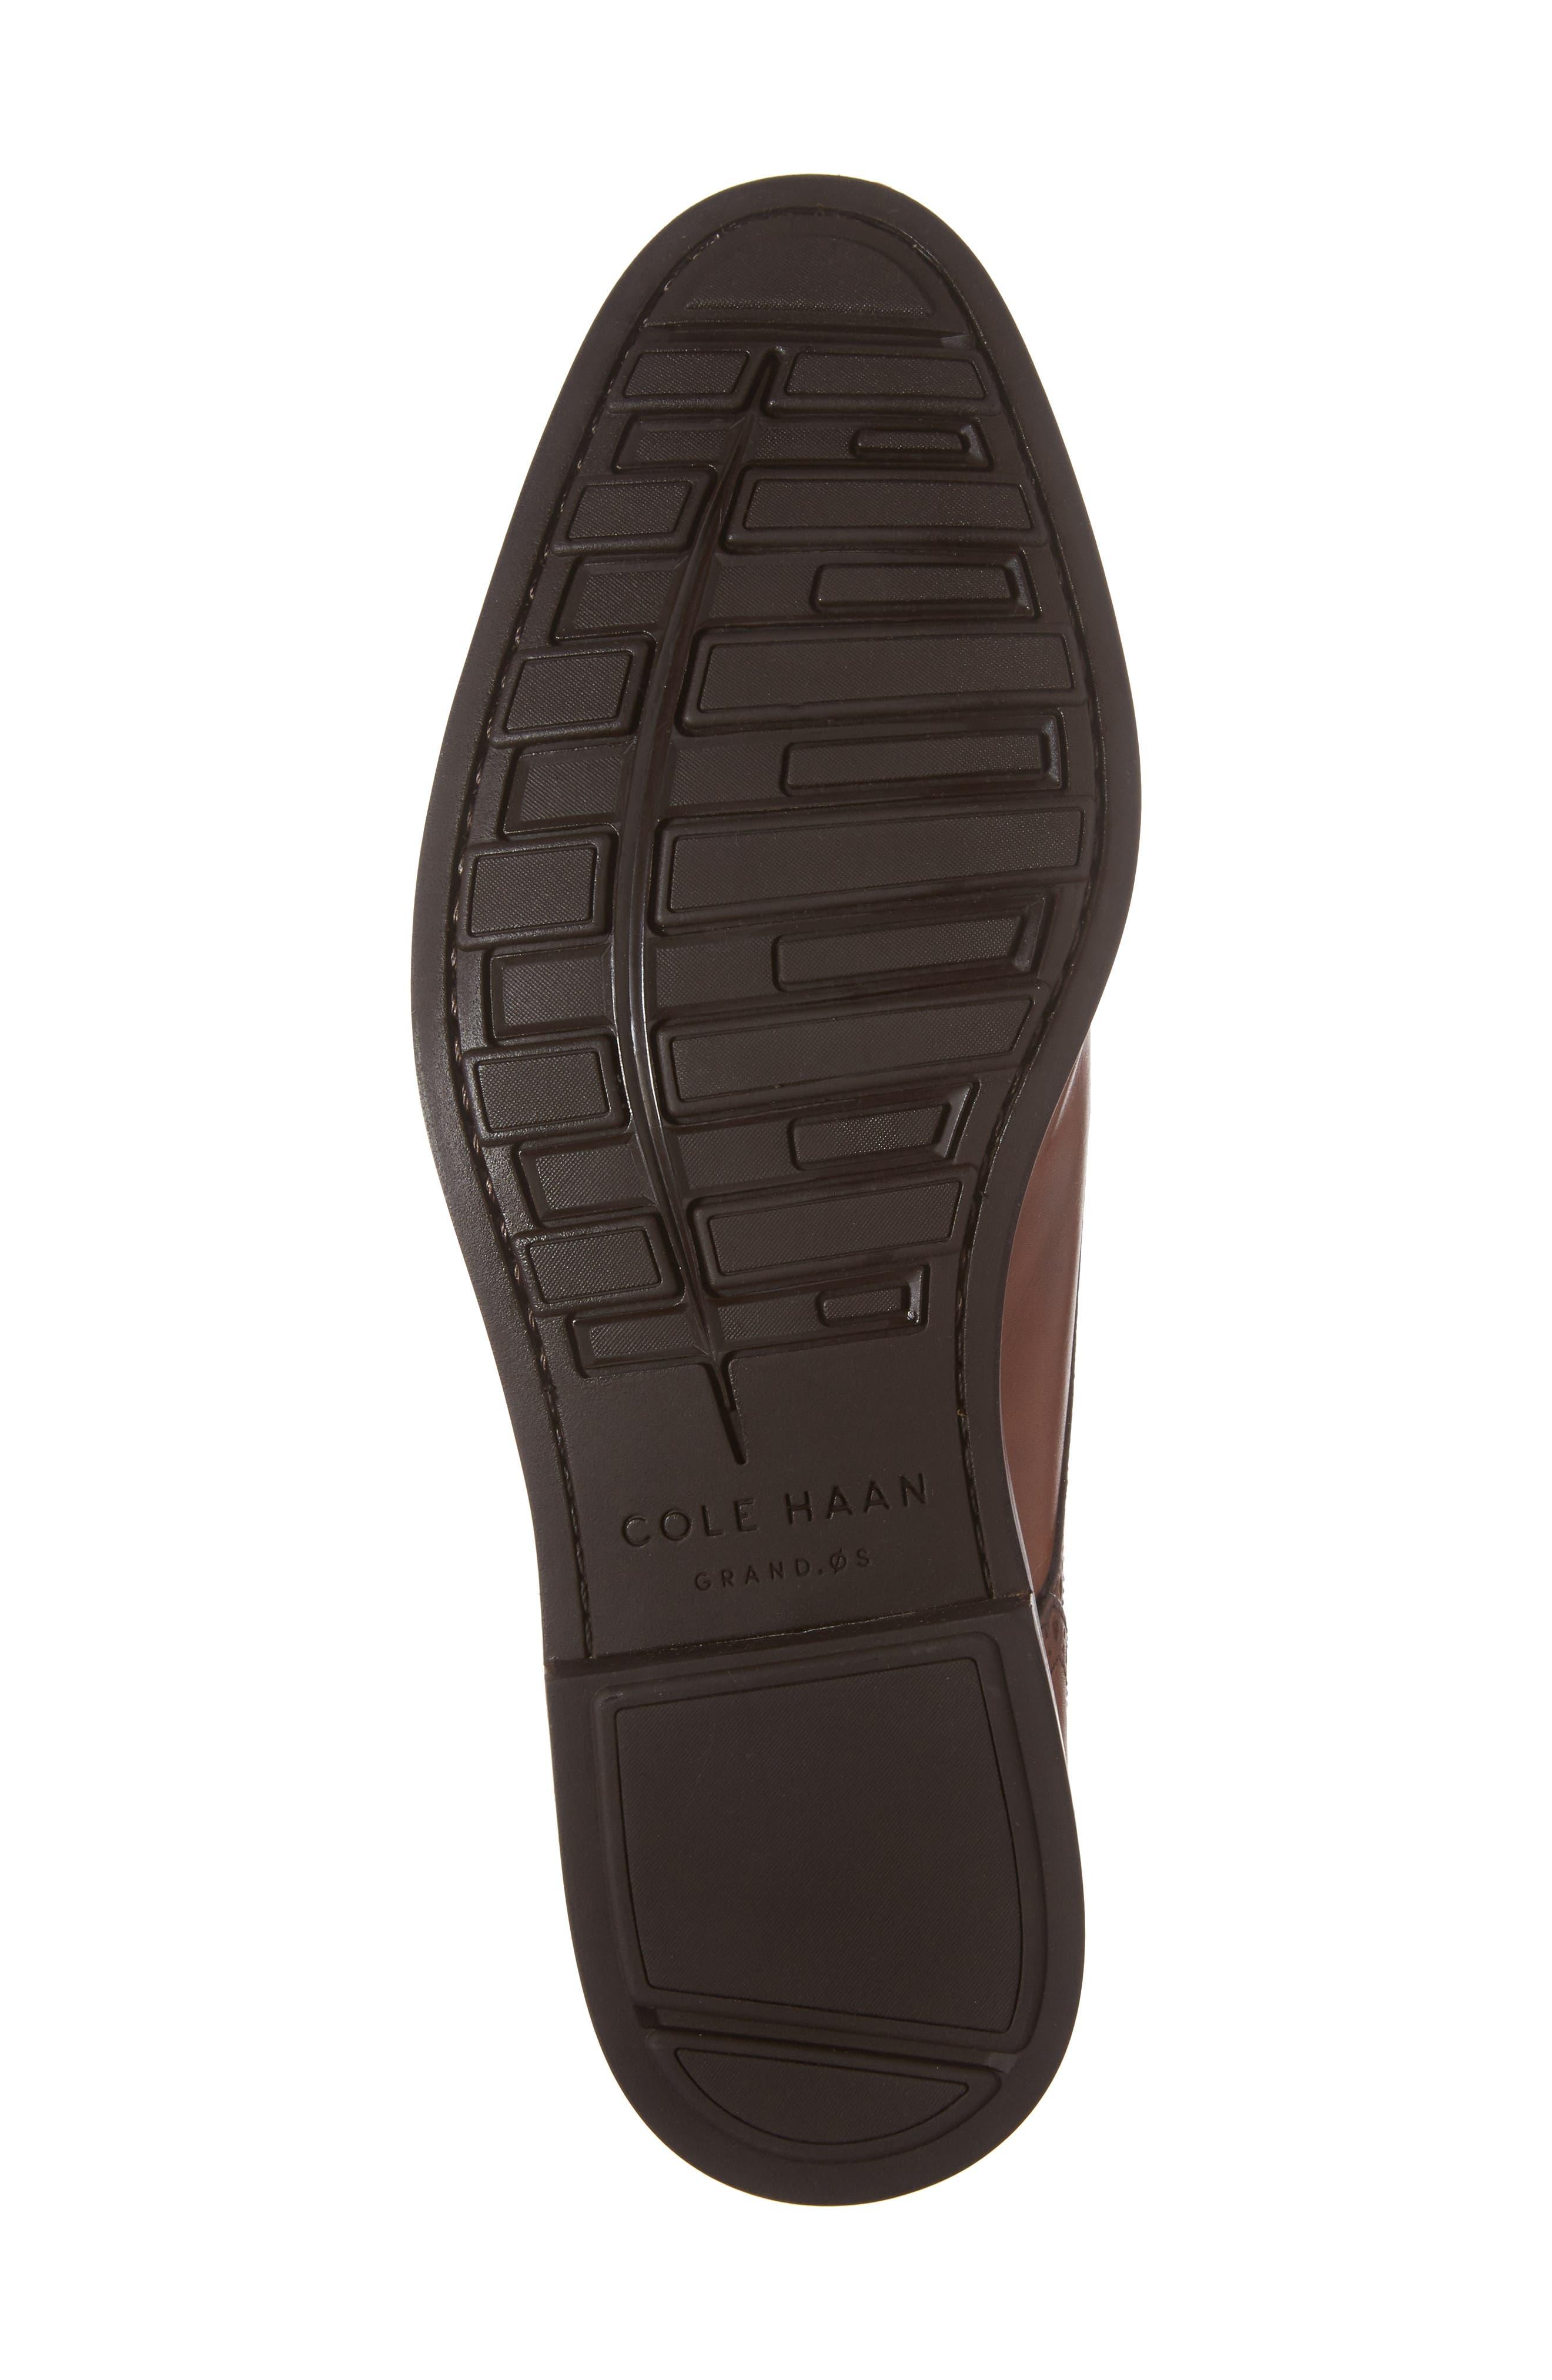 Hamilton Double Monk Strap Shoe,                             Alternate thumbnail 6, color,                             British Tan Leather